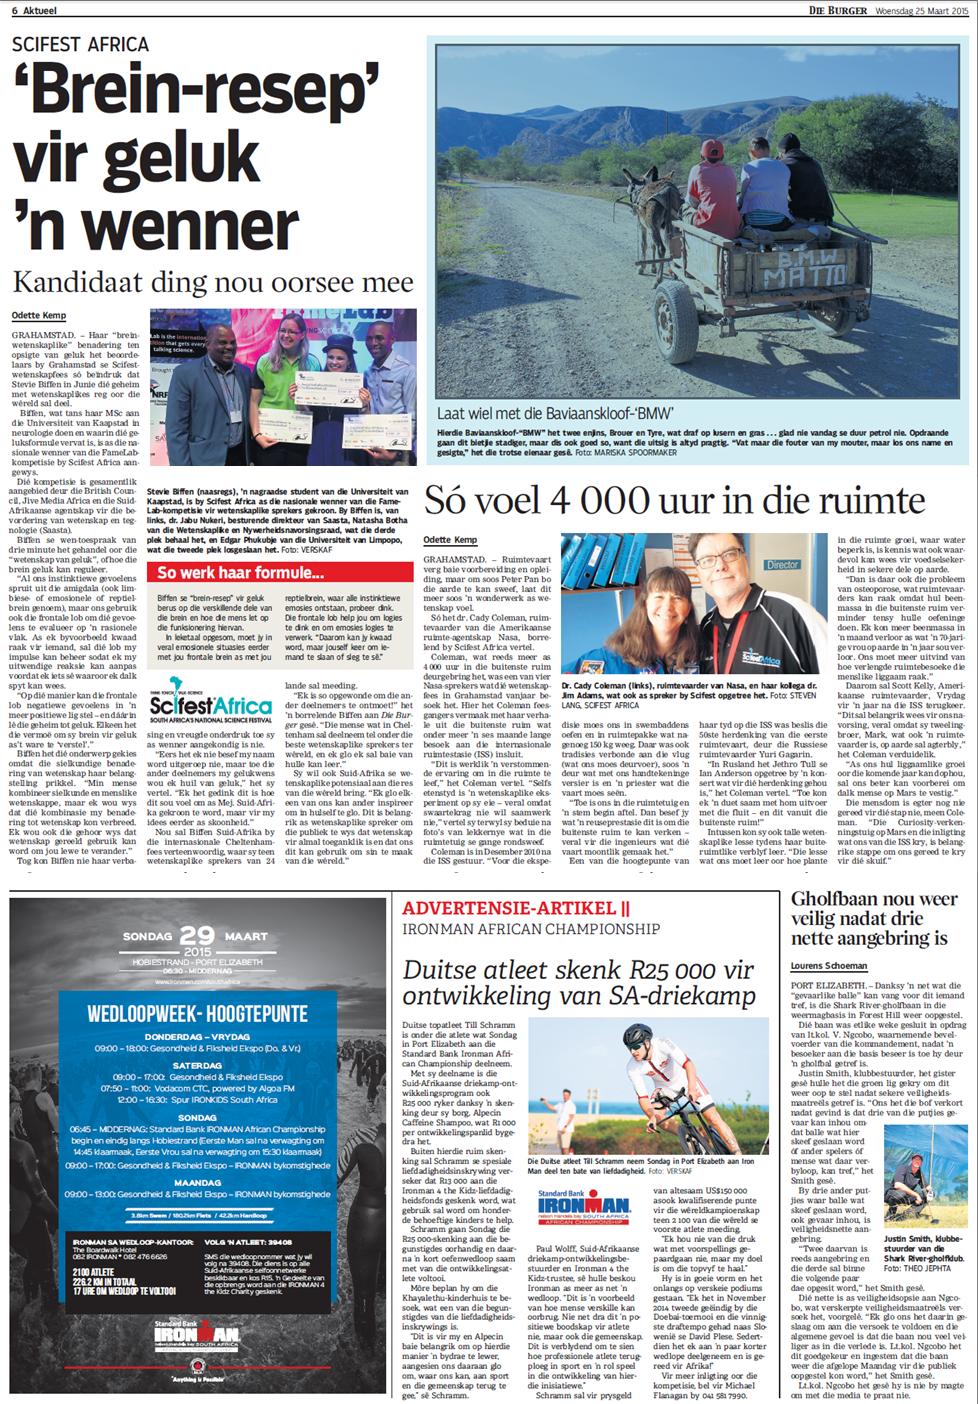 Beeld 31 March 2015 (Afrikaans)